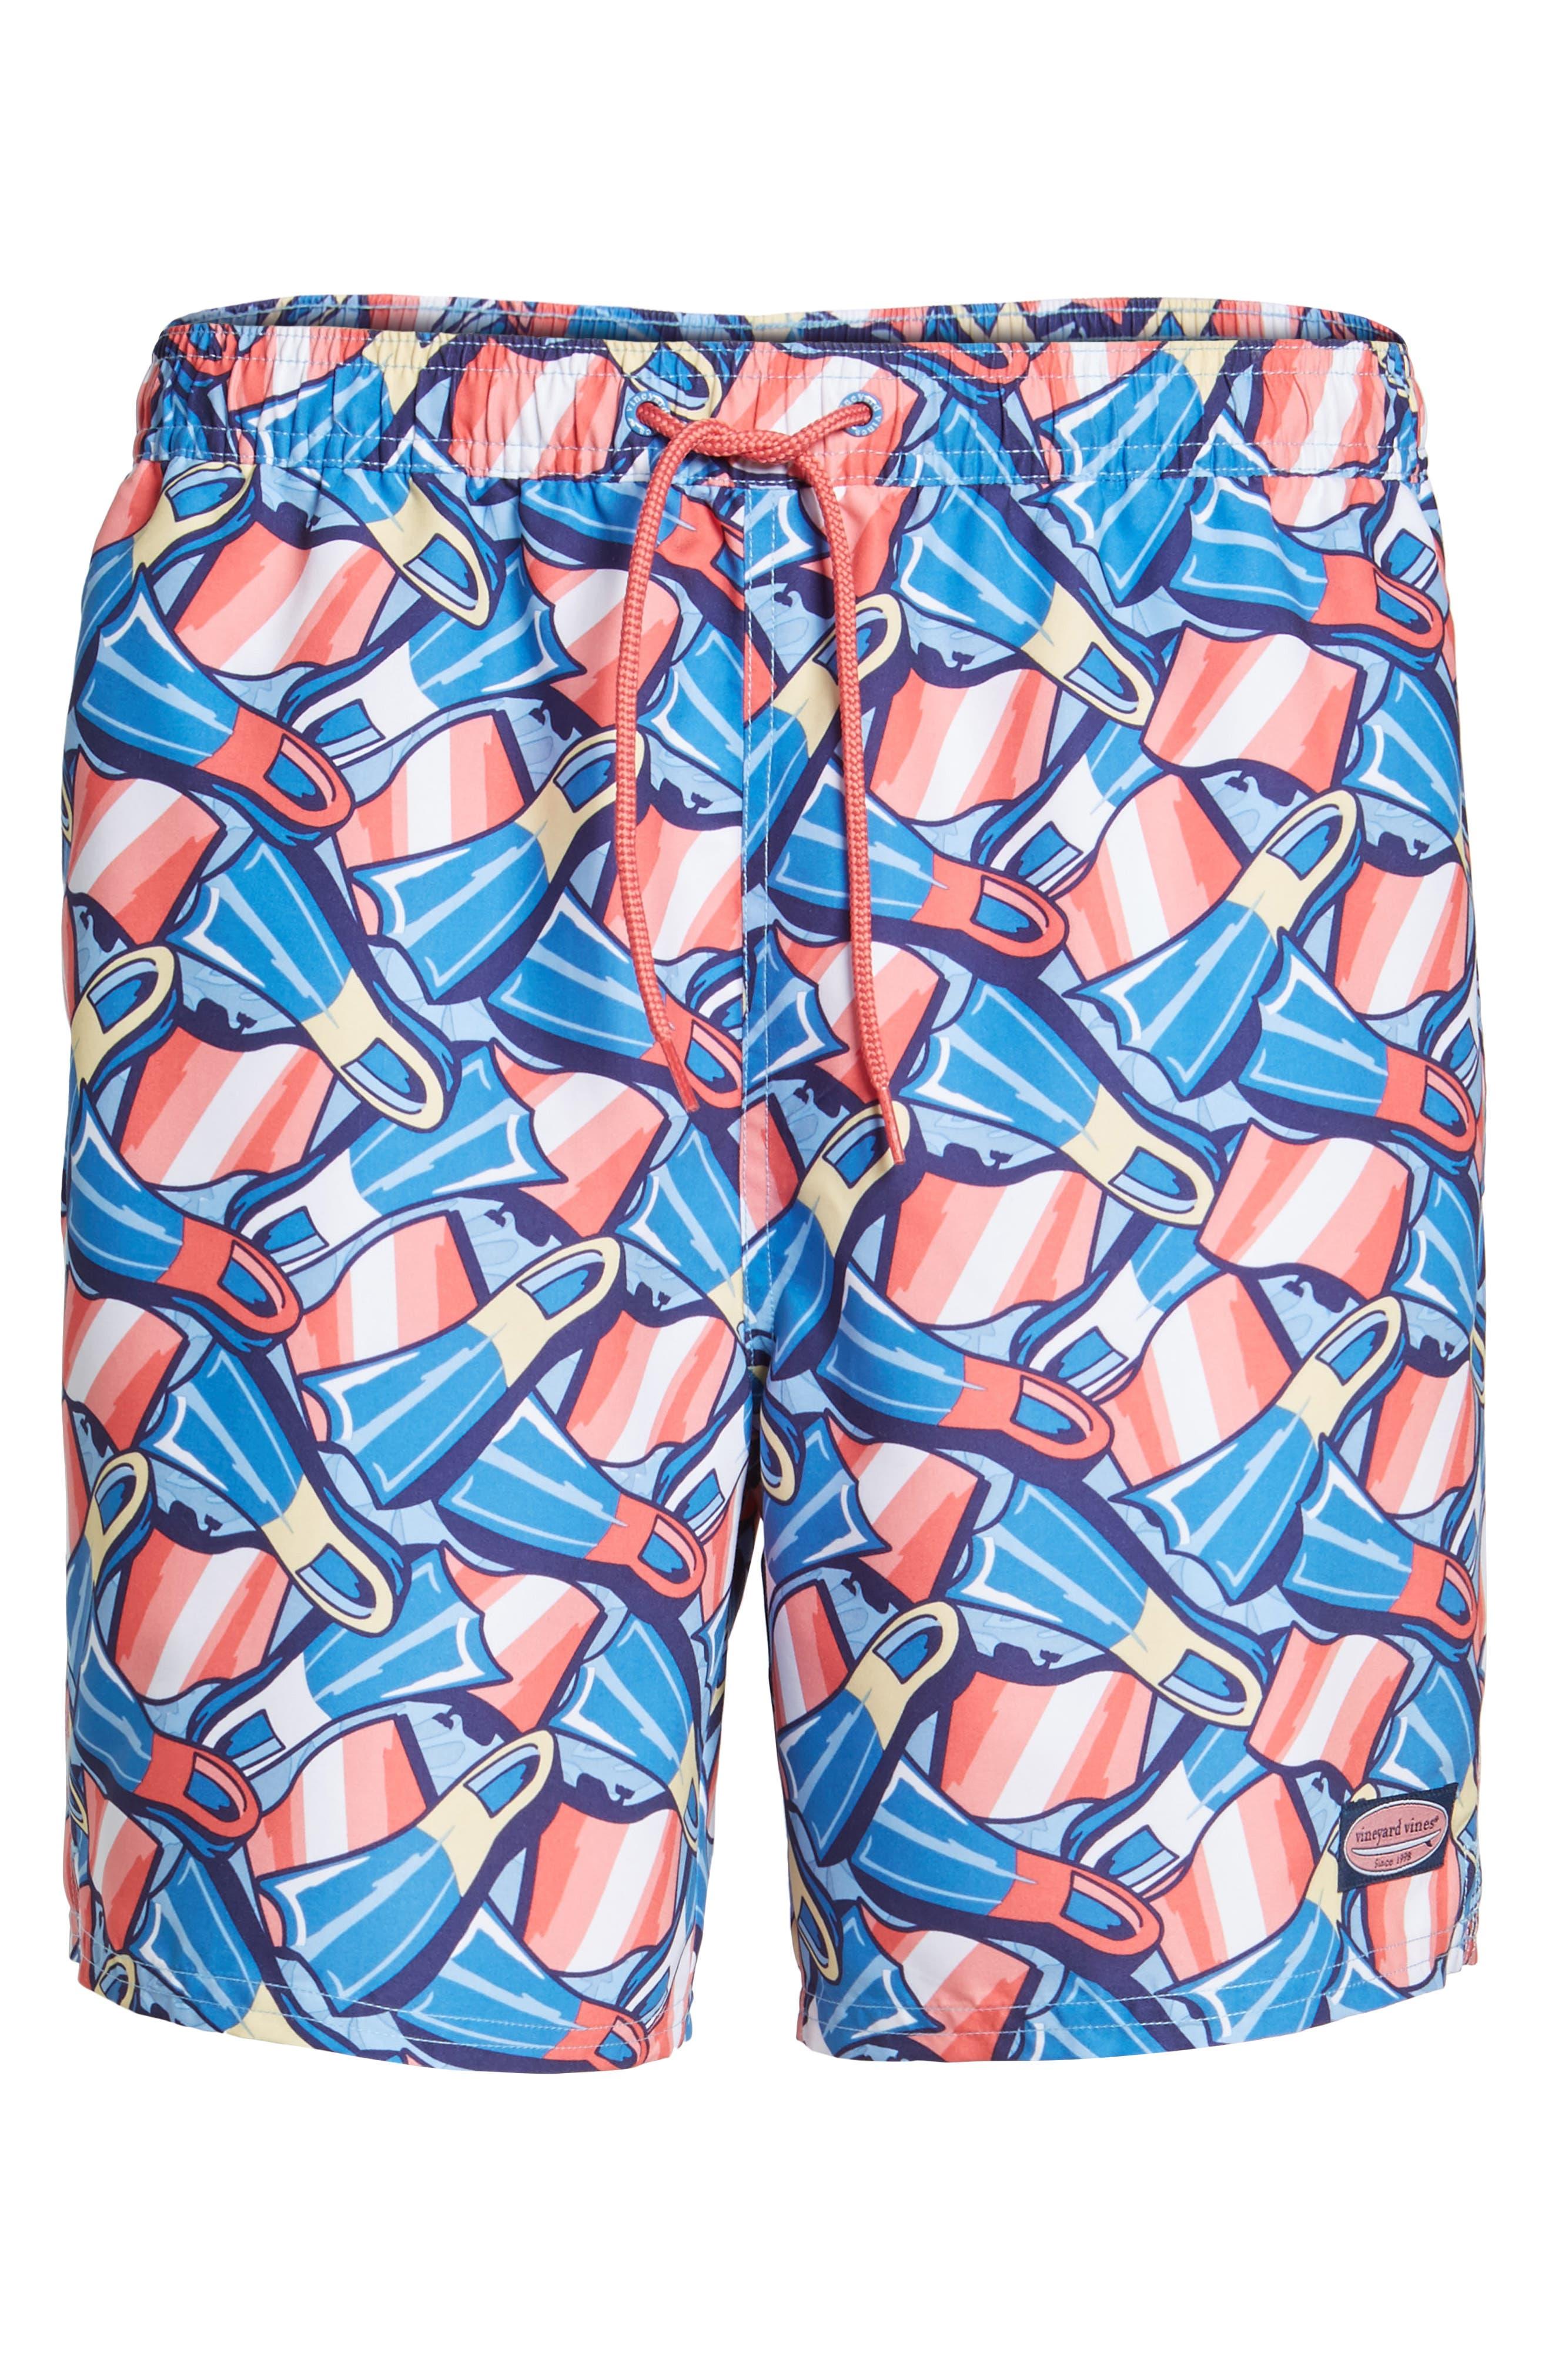 Flippers Chappy Swim Trunks,                             Alternate thumbnail 6, color,                             Dockside Blue